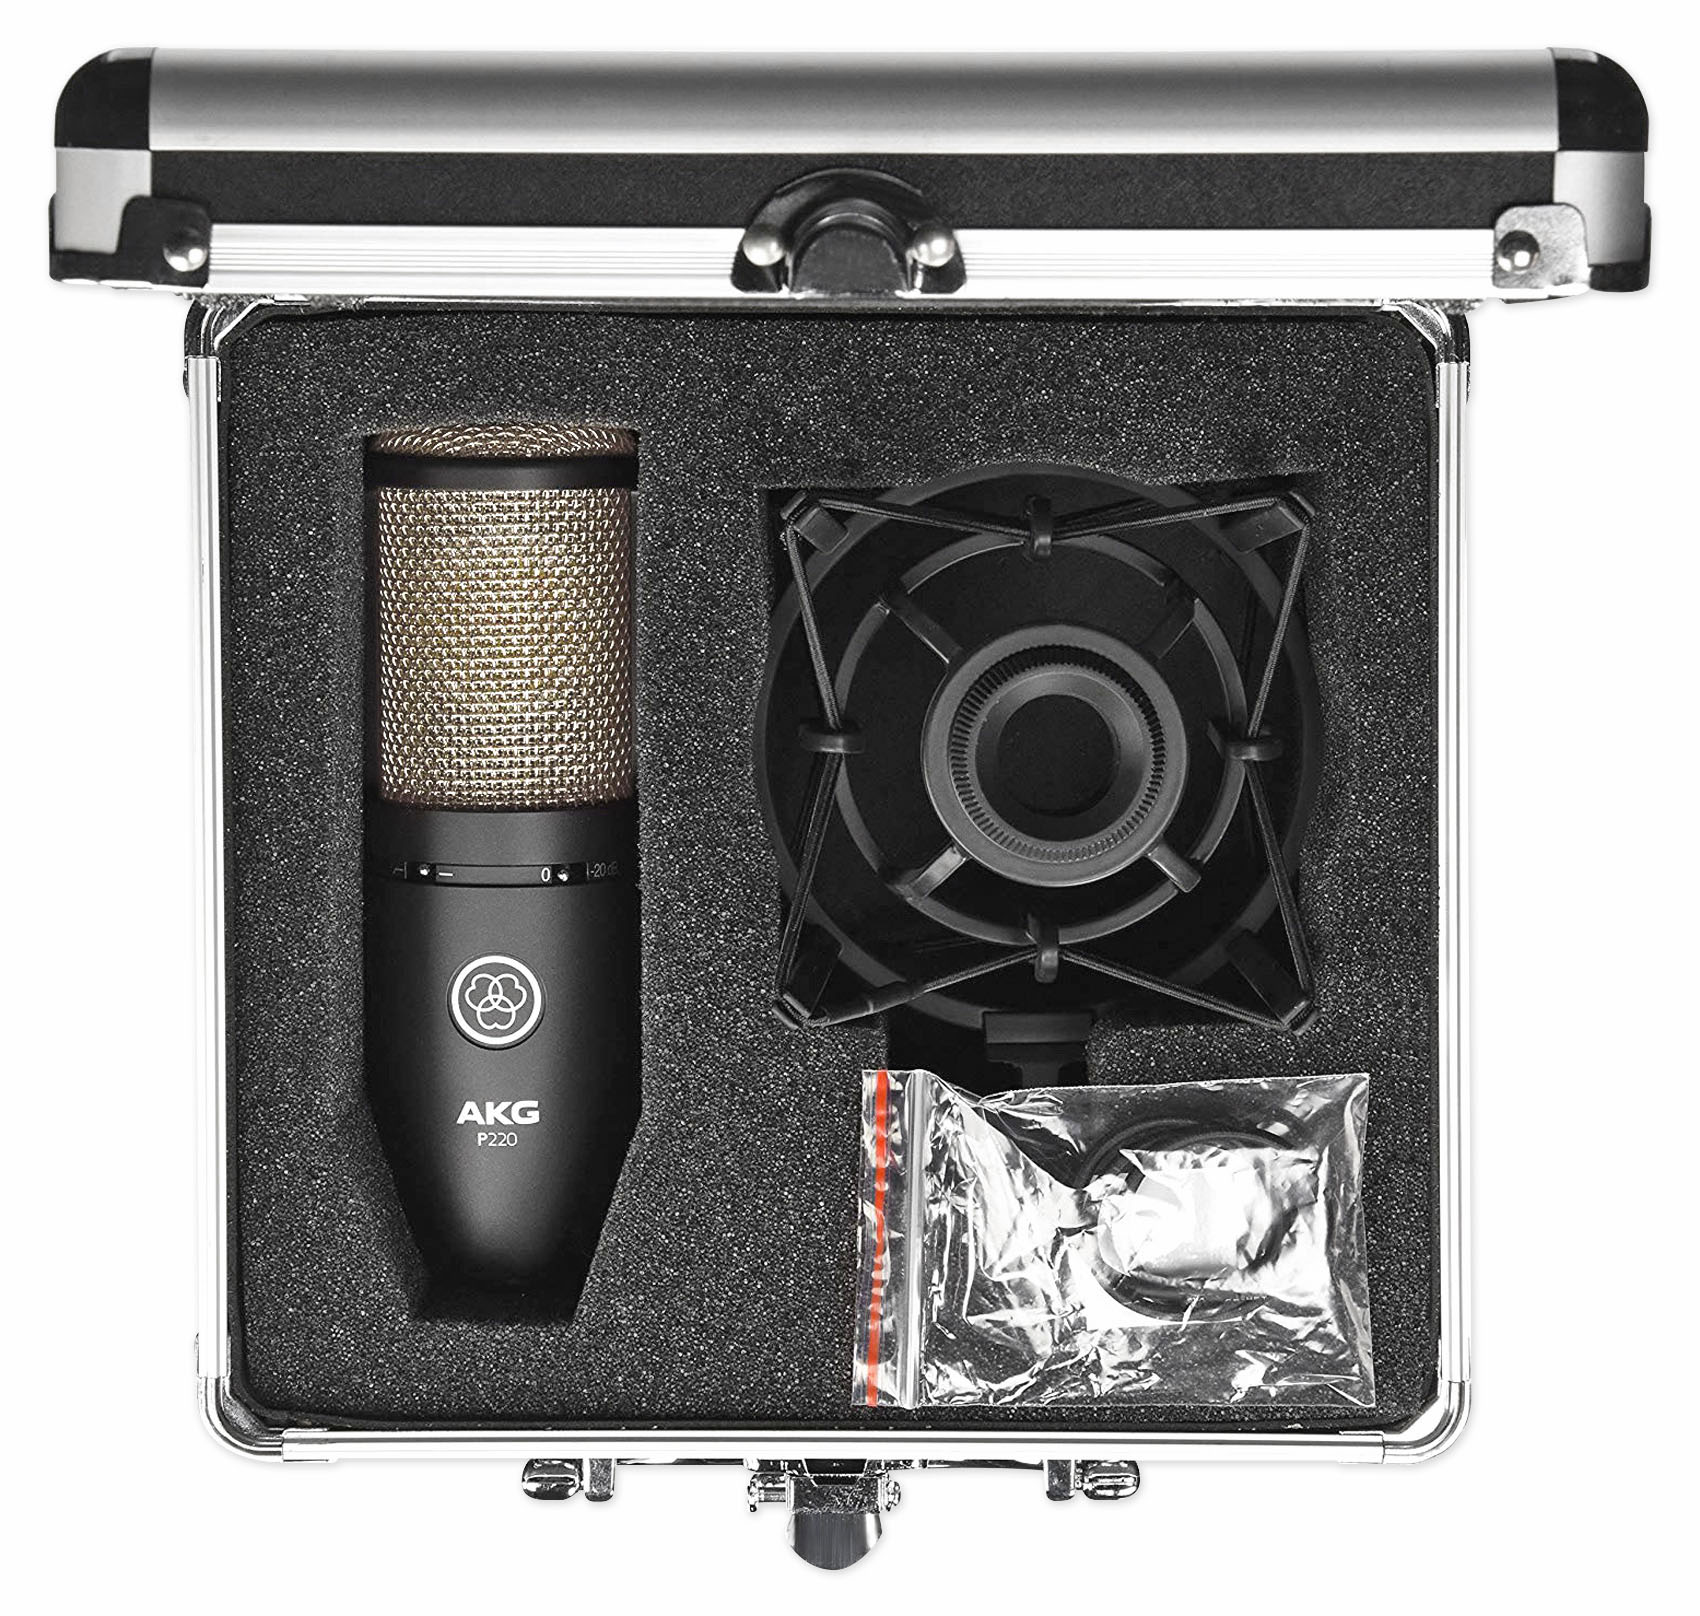 AKG P220 Studio Condenser Microphone Recording Mic+Shockmount+Carry Case